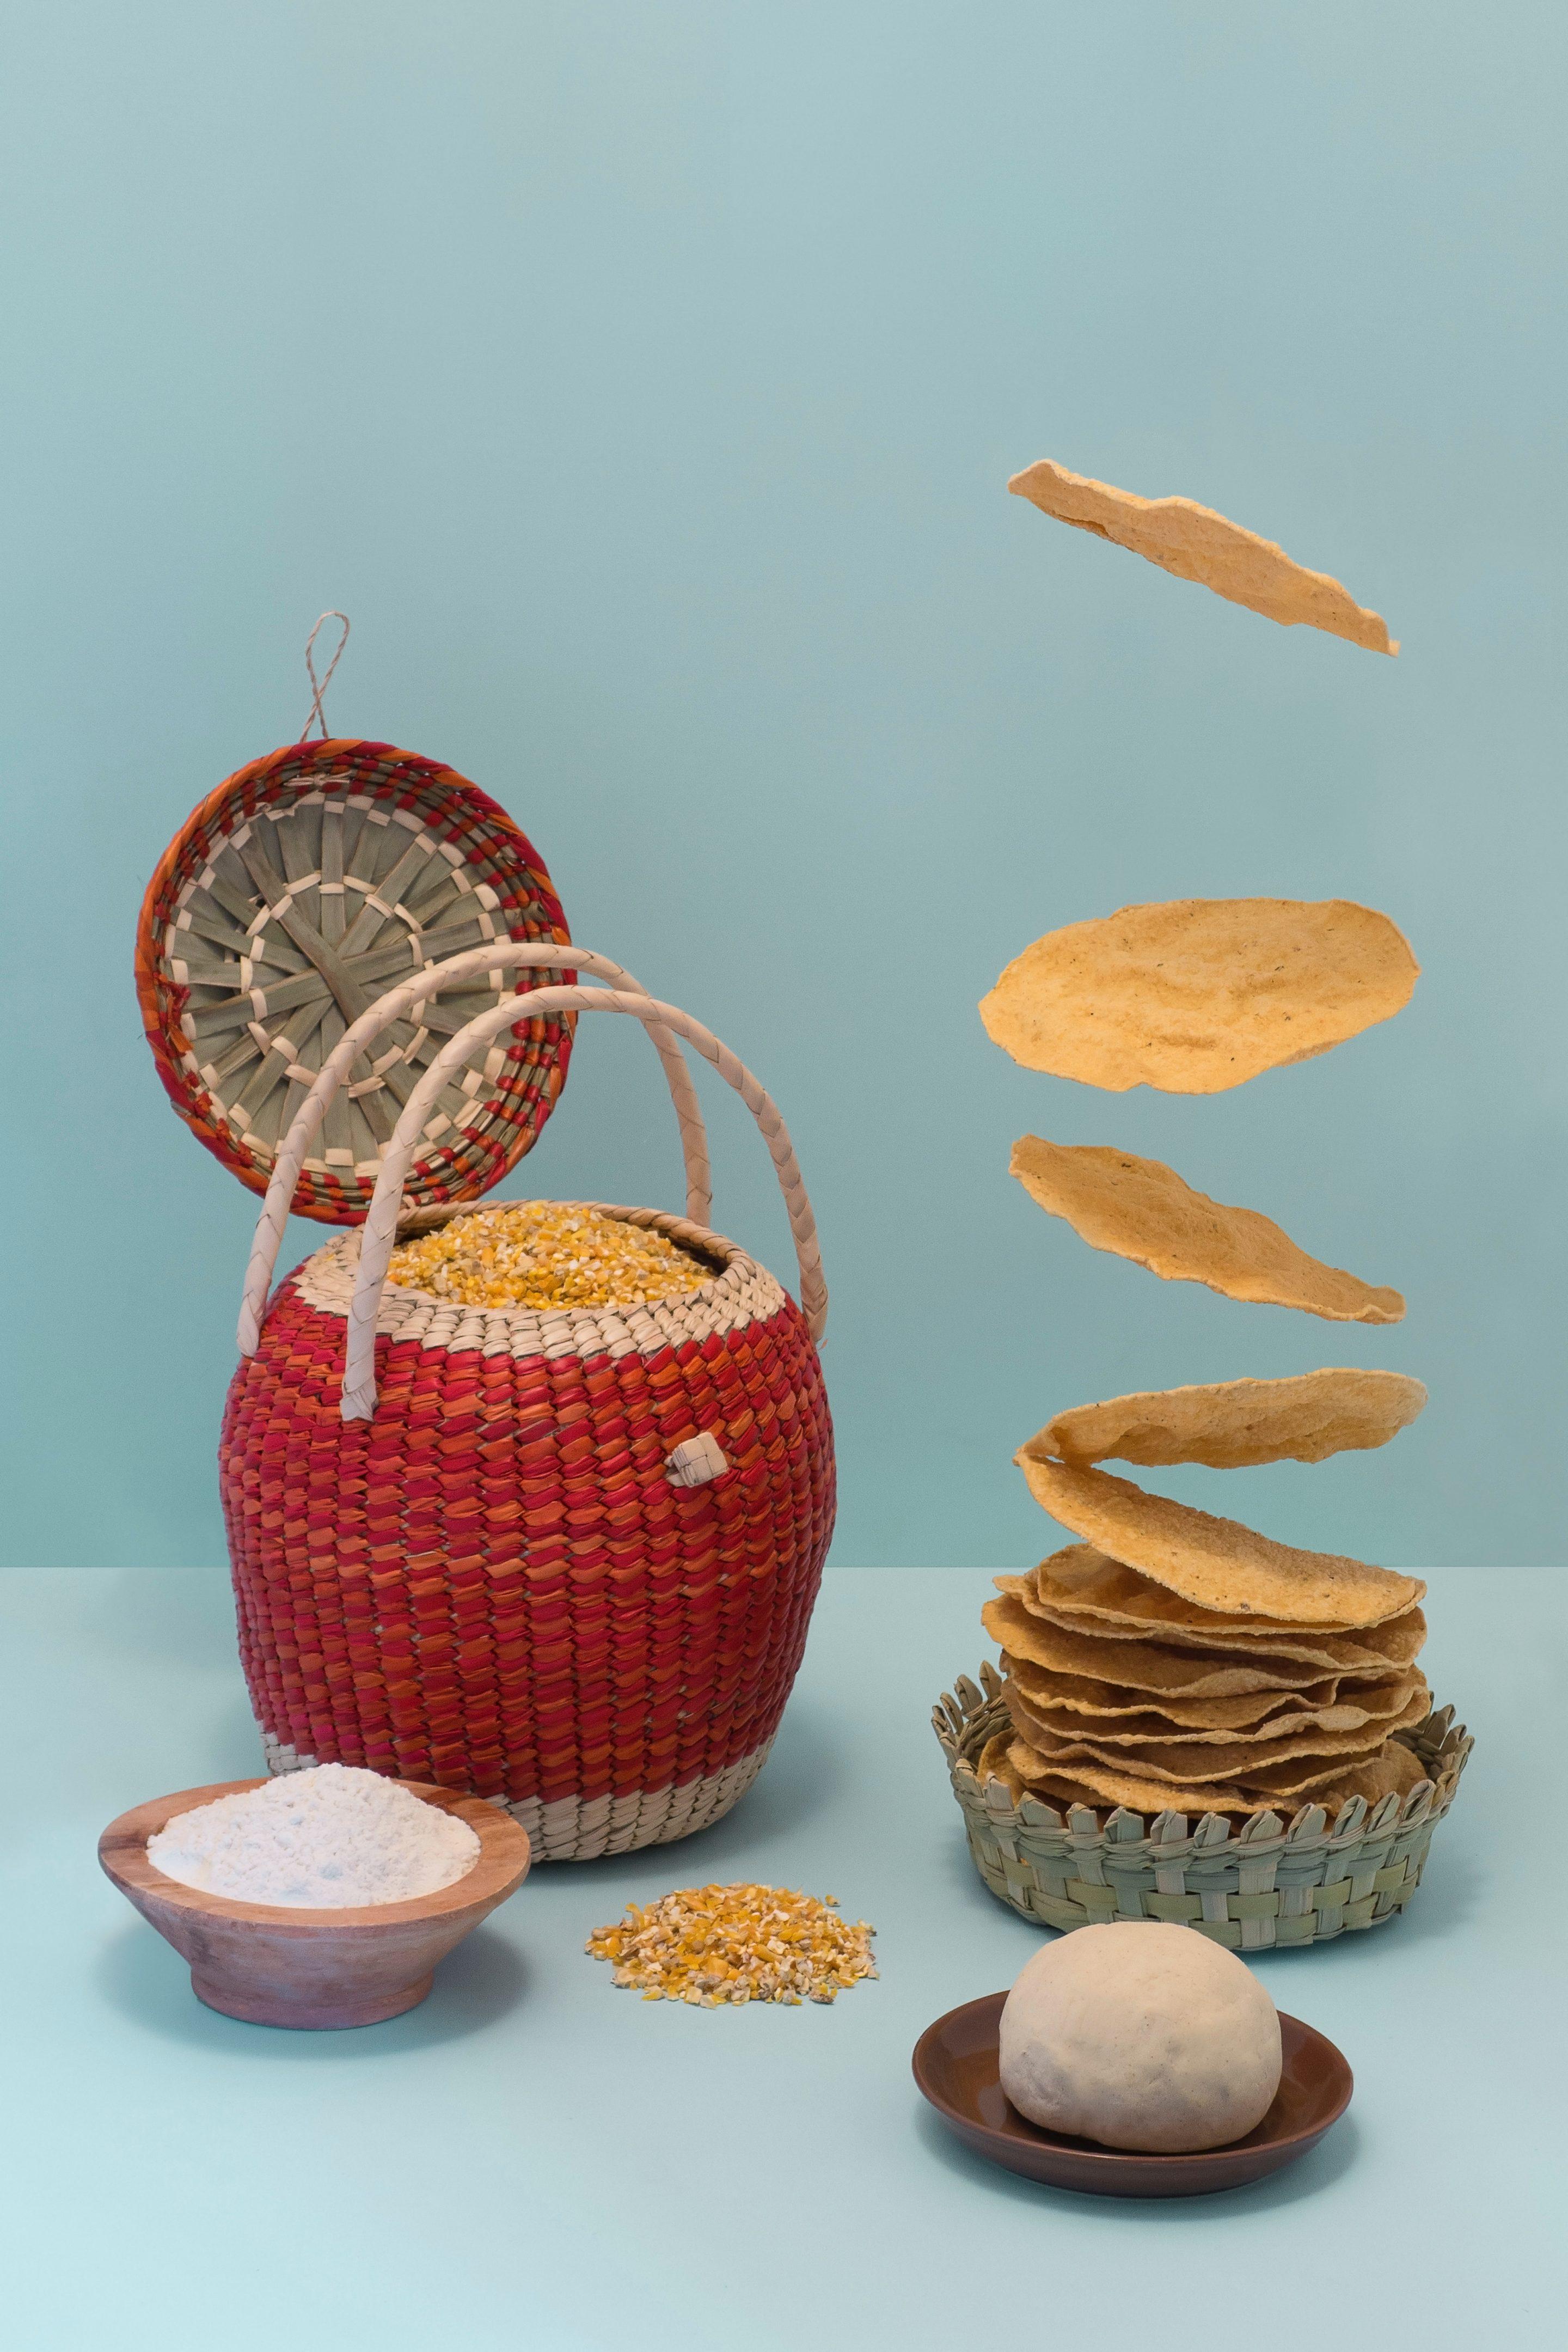 Oven Baked Tostadas Shells via @mermaidsandmojitos